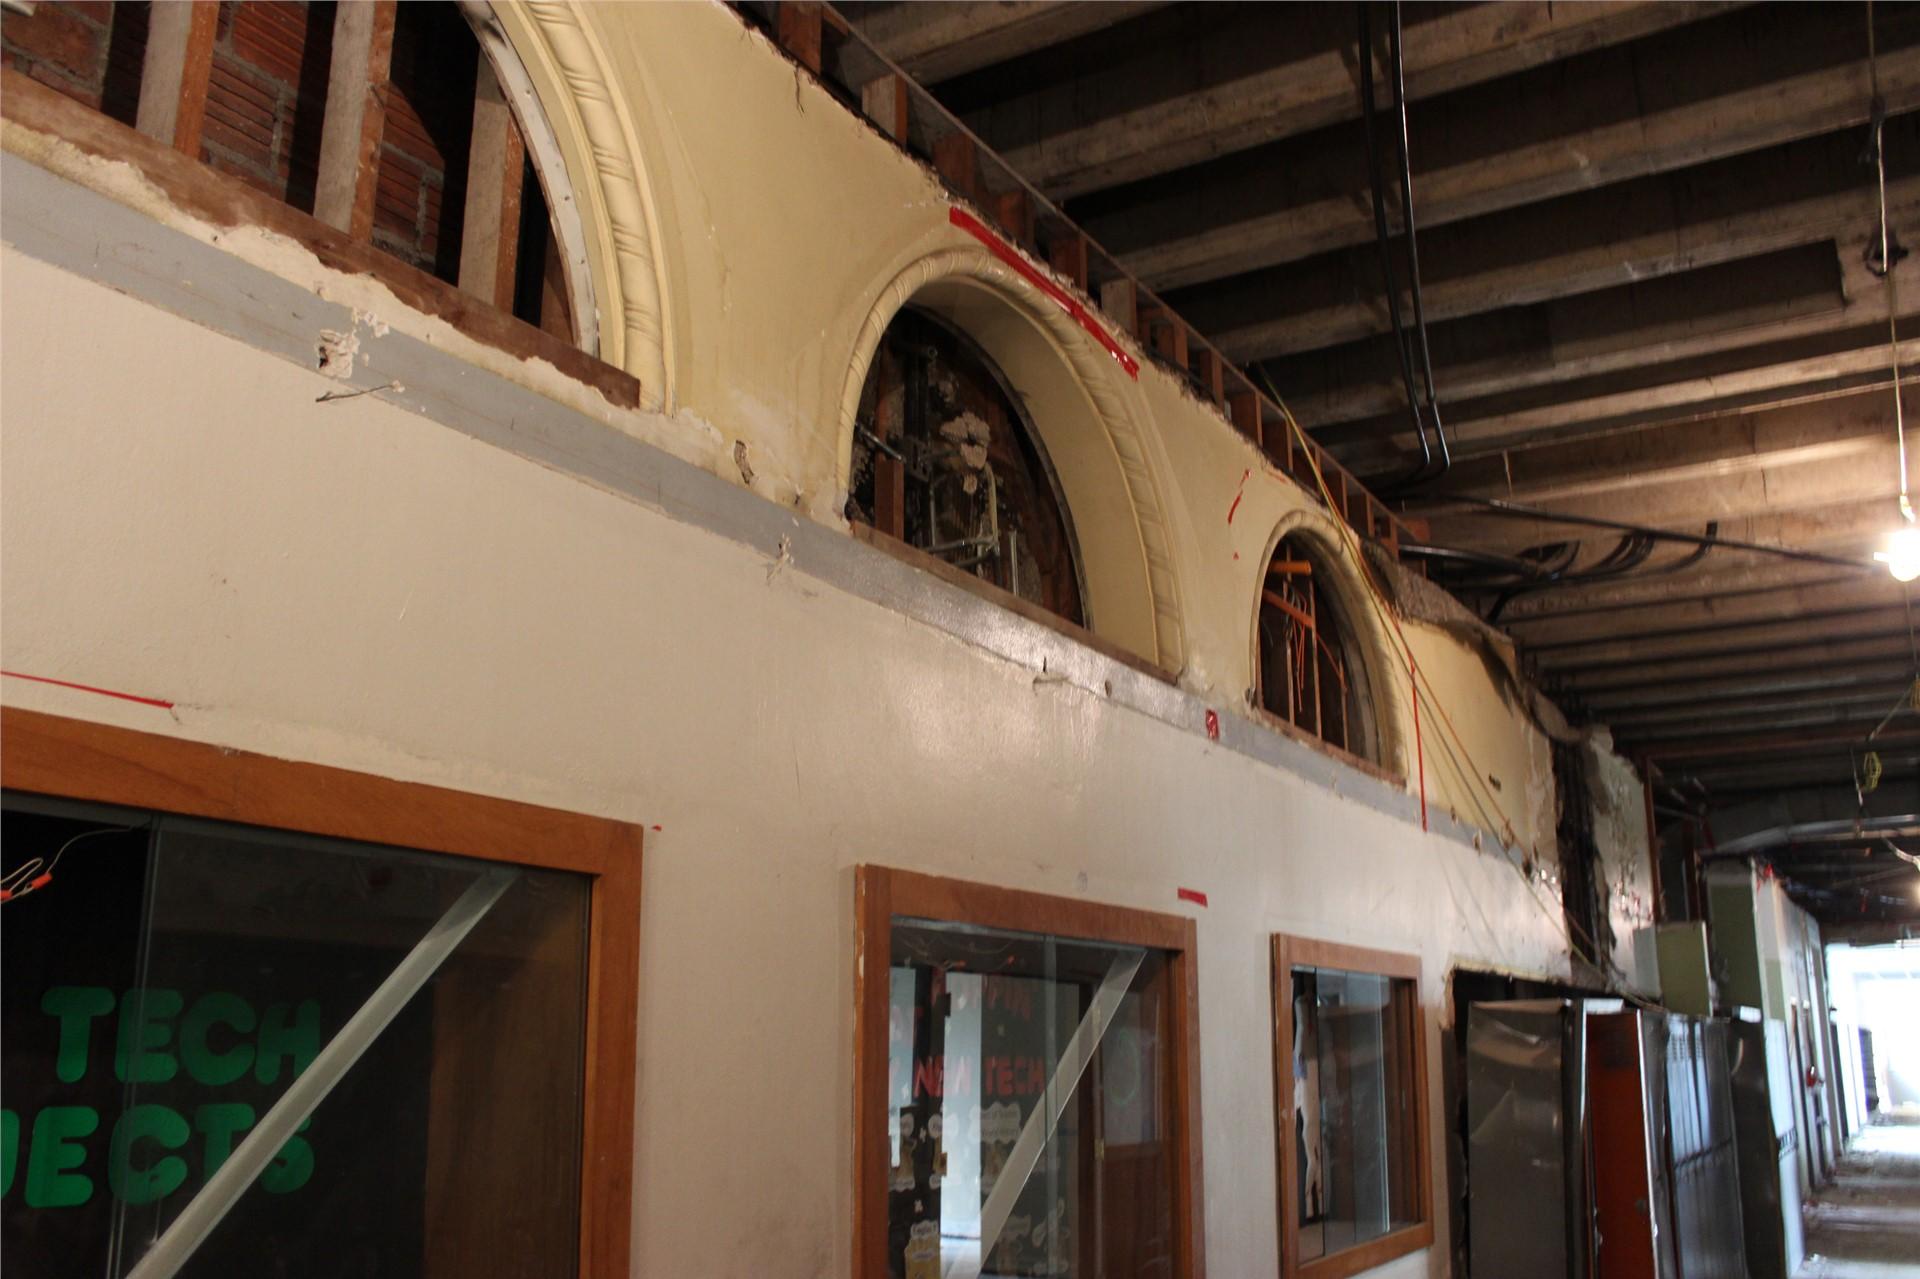 Plaster details were revealed above ceiling on third floor hallway